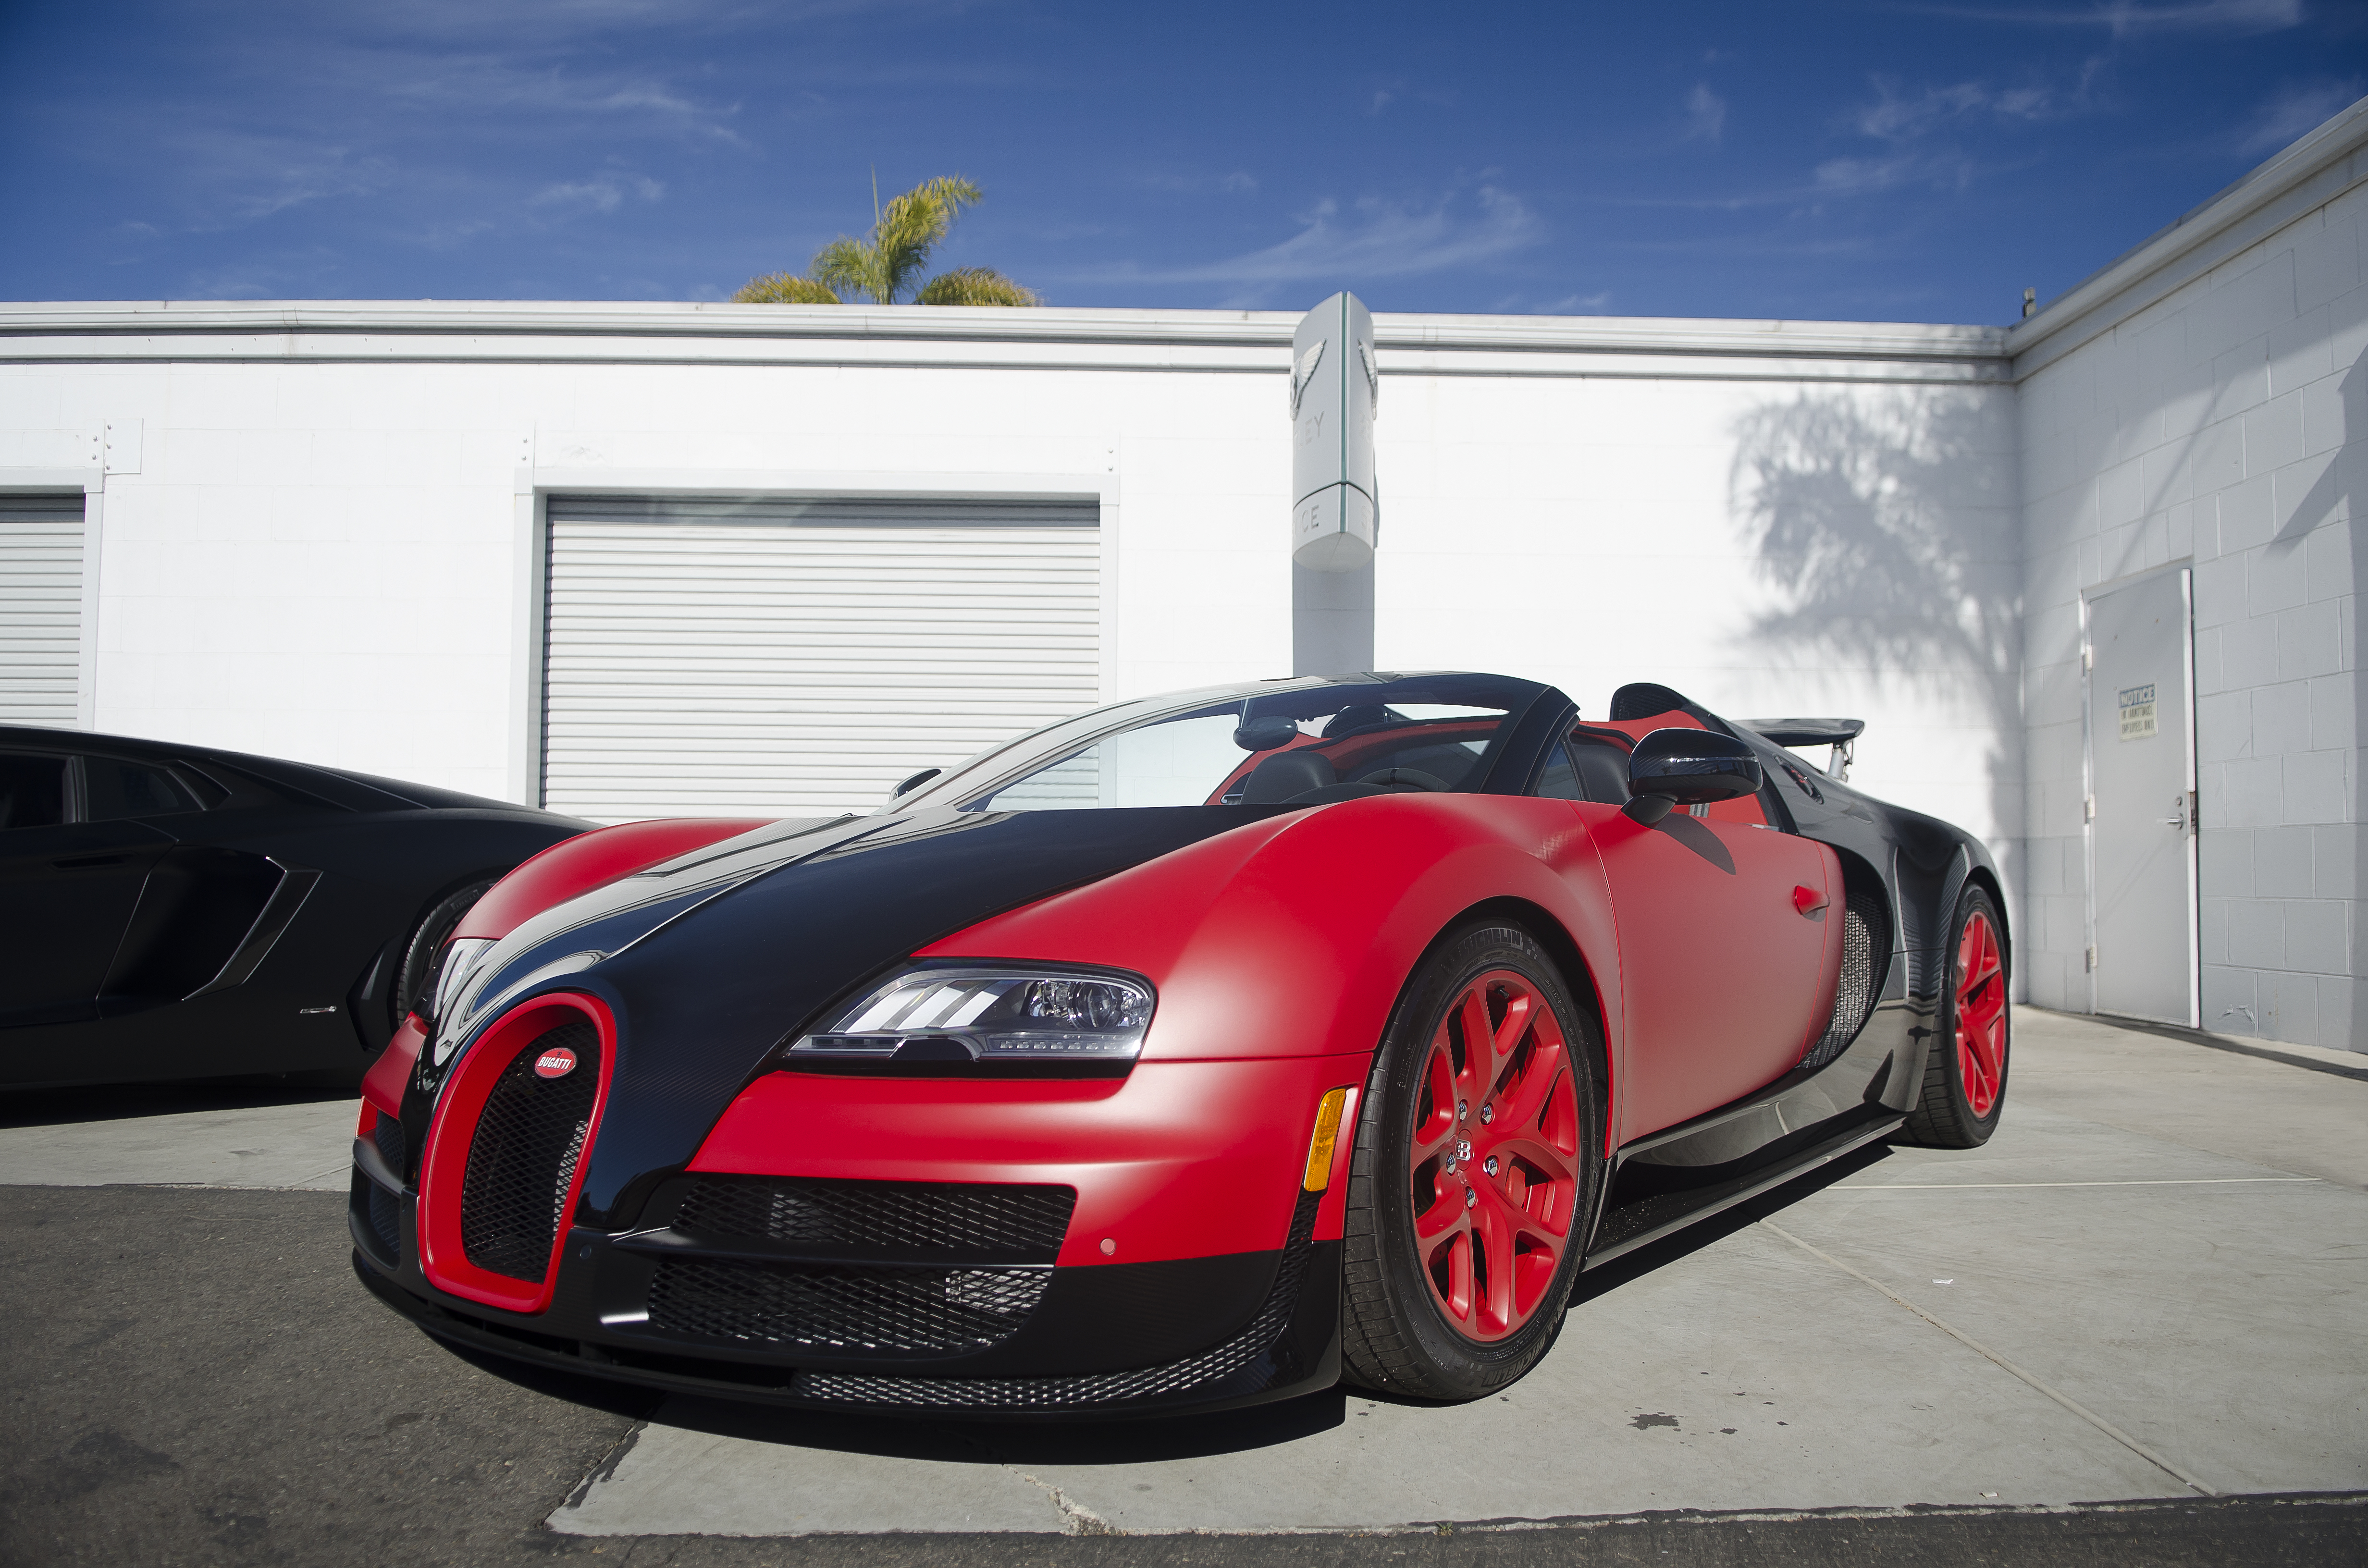 Matte_Red-Black_Bugatti_Veyron_Grand_Sport_Vitesse_%2815832617282%29 Terrific New Bugatti Veyron Grand Sport Vitesse Cars Trend